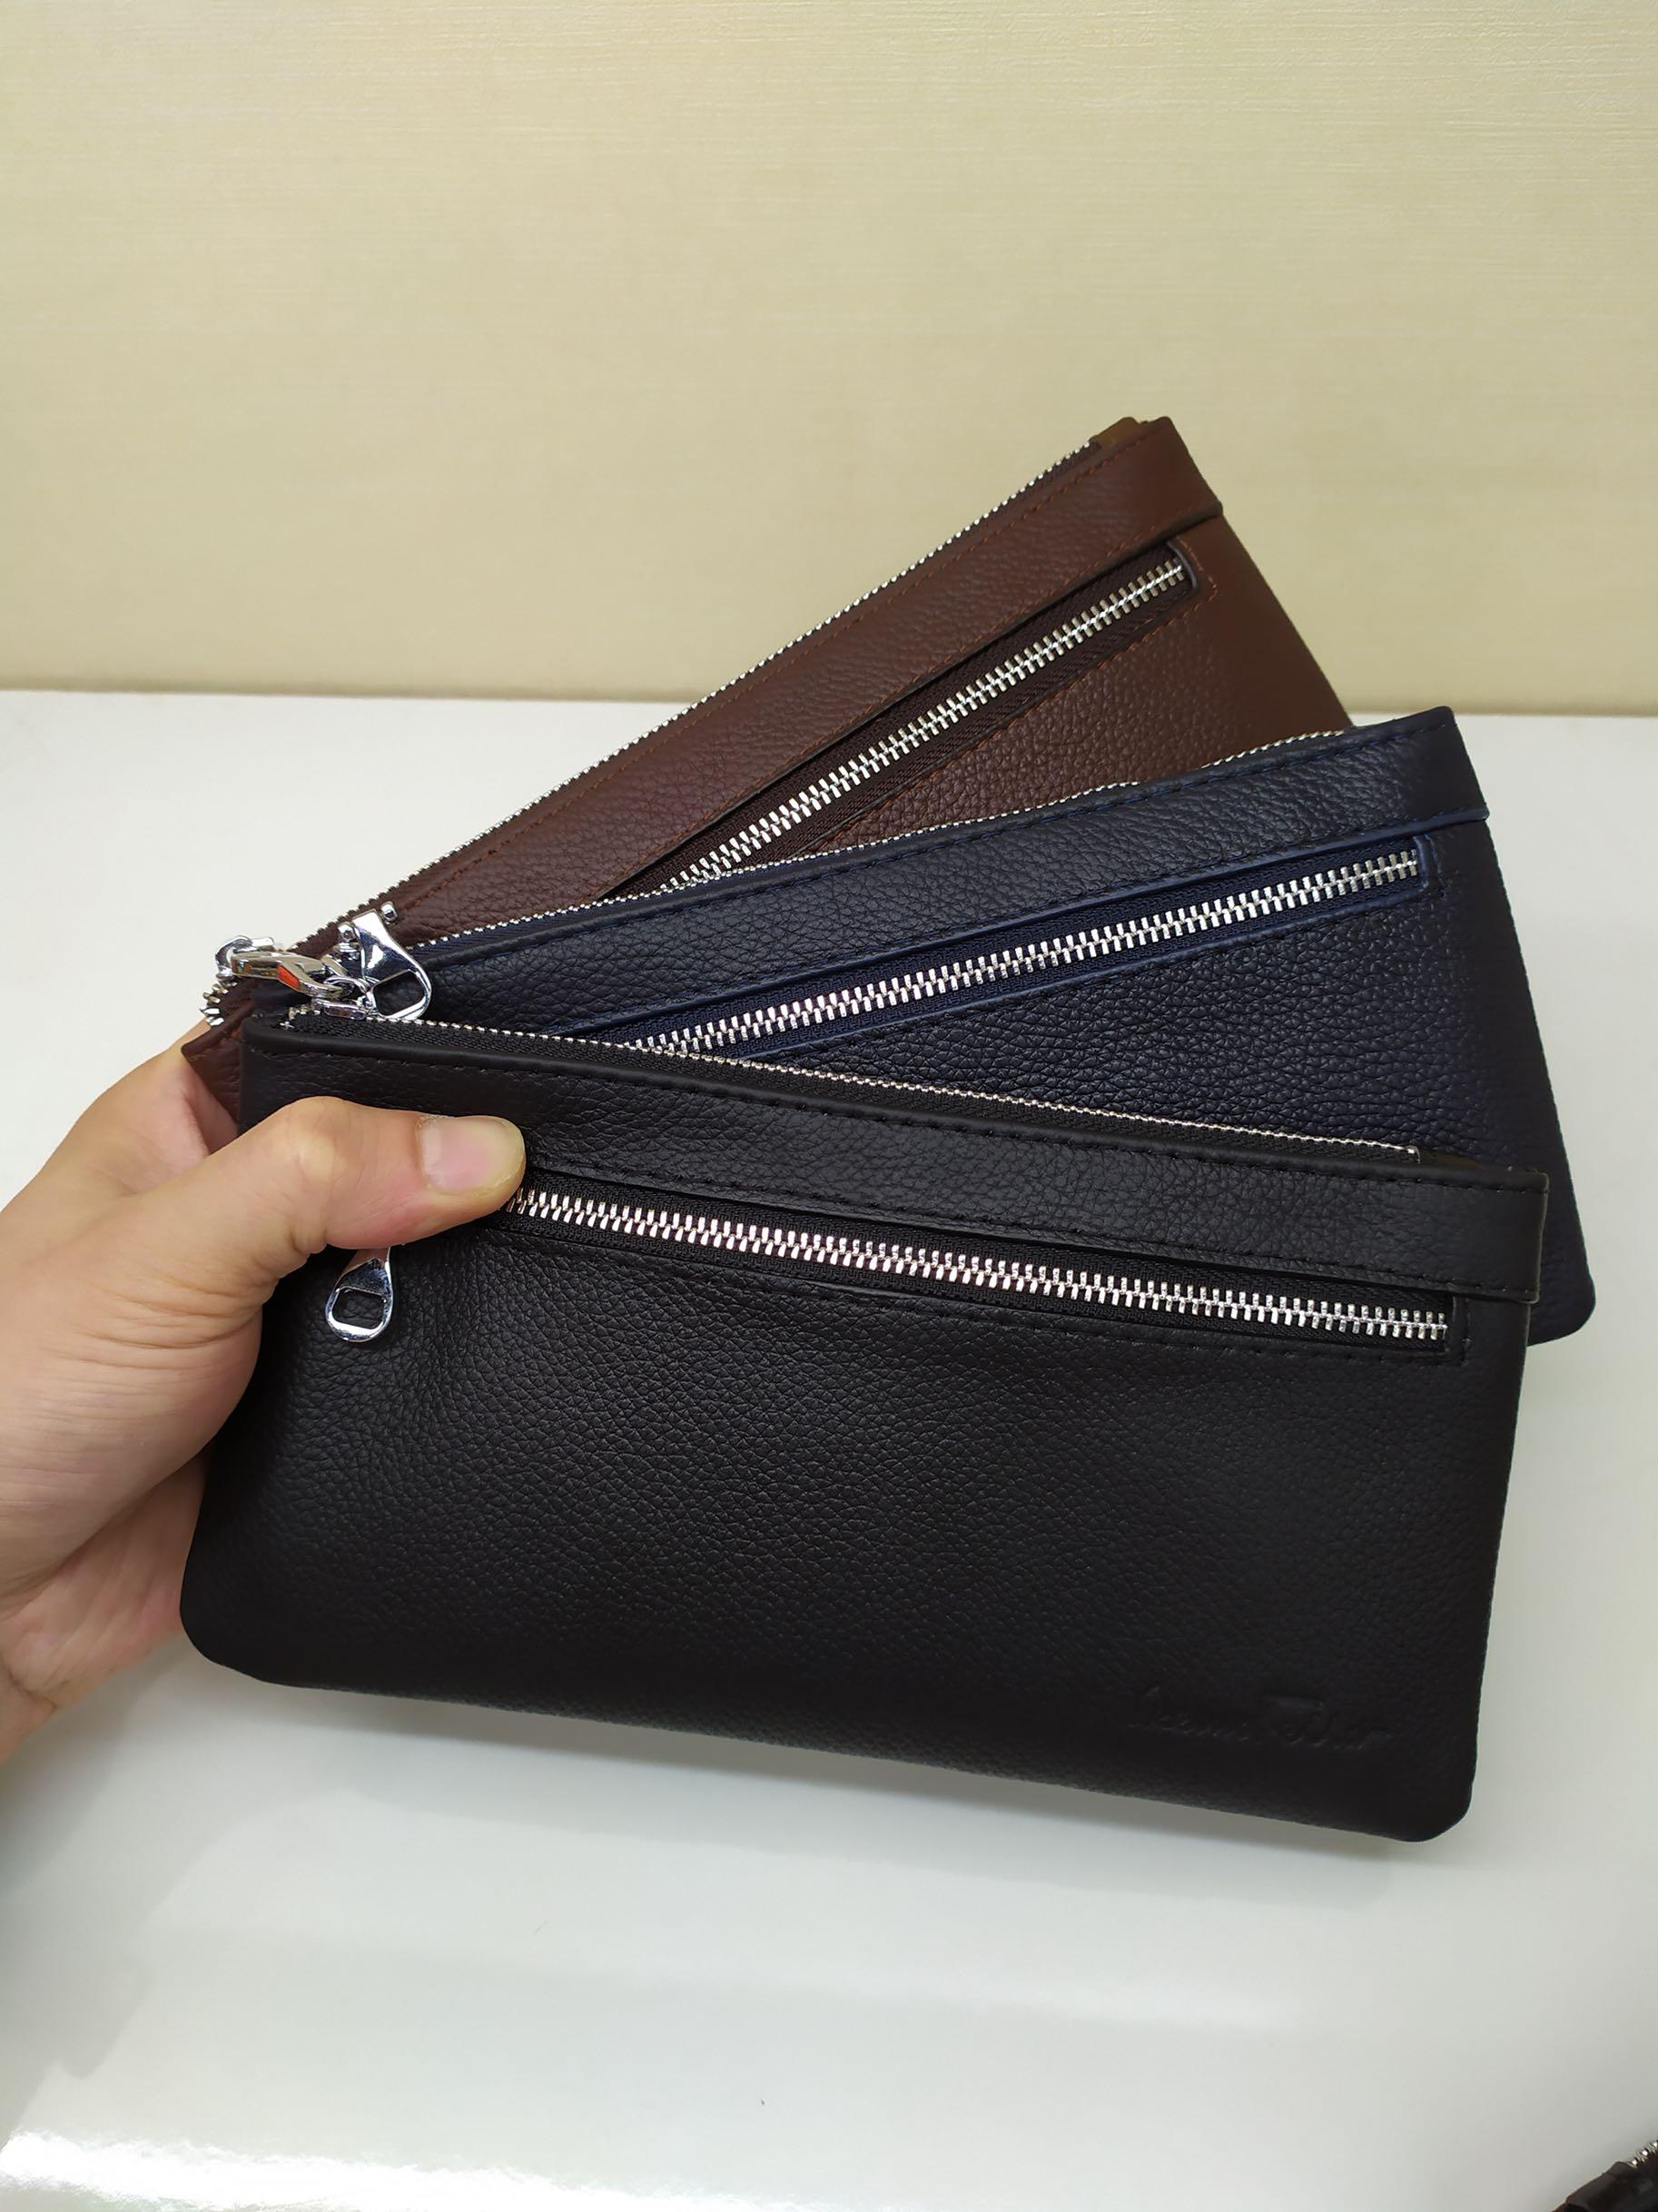 Feighham genuine handbag leather leisure business long zipper purse pure leather soft hand bag